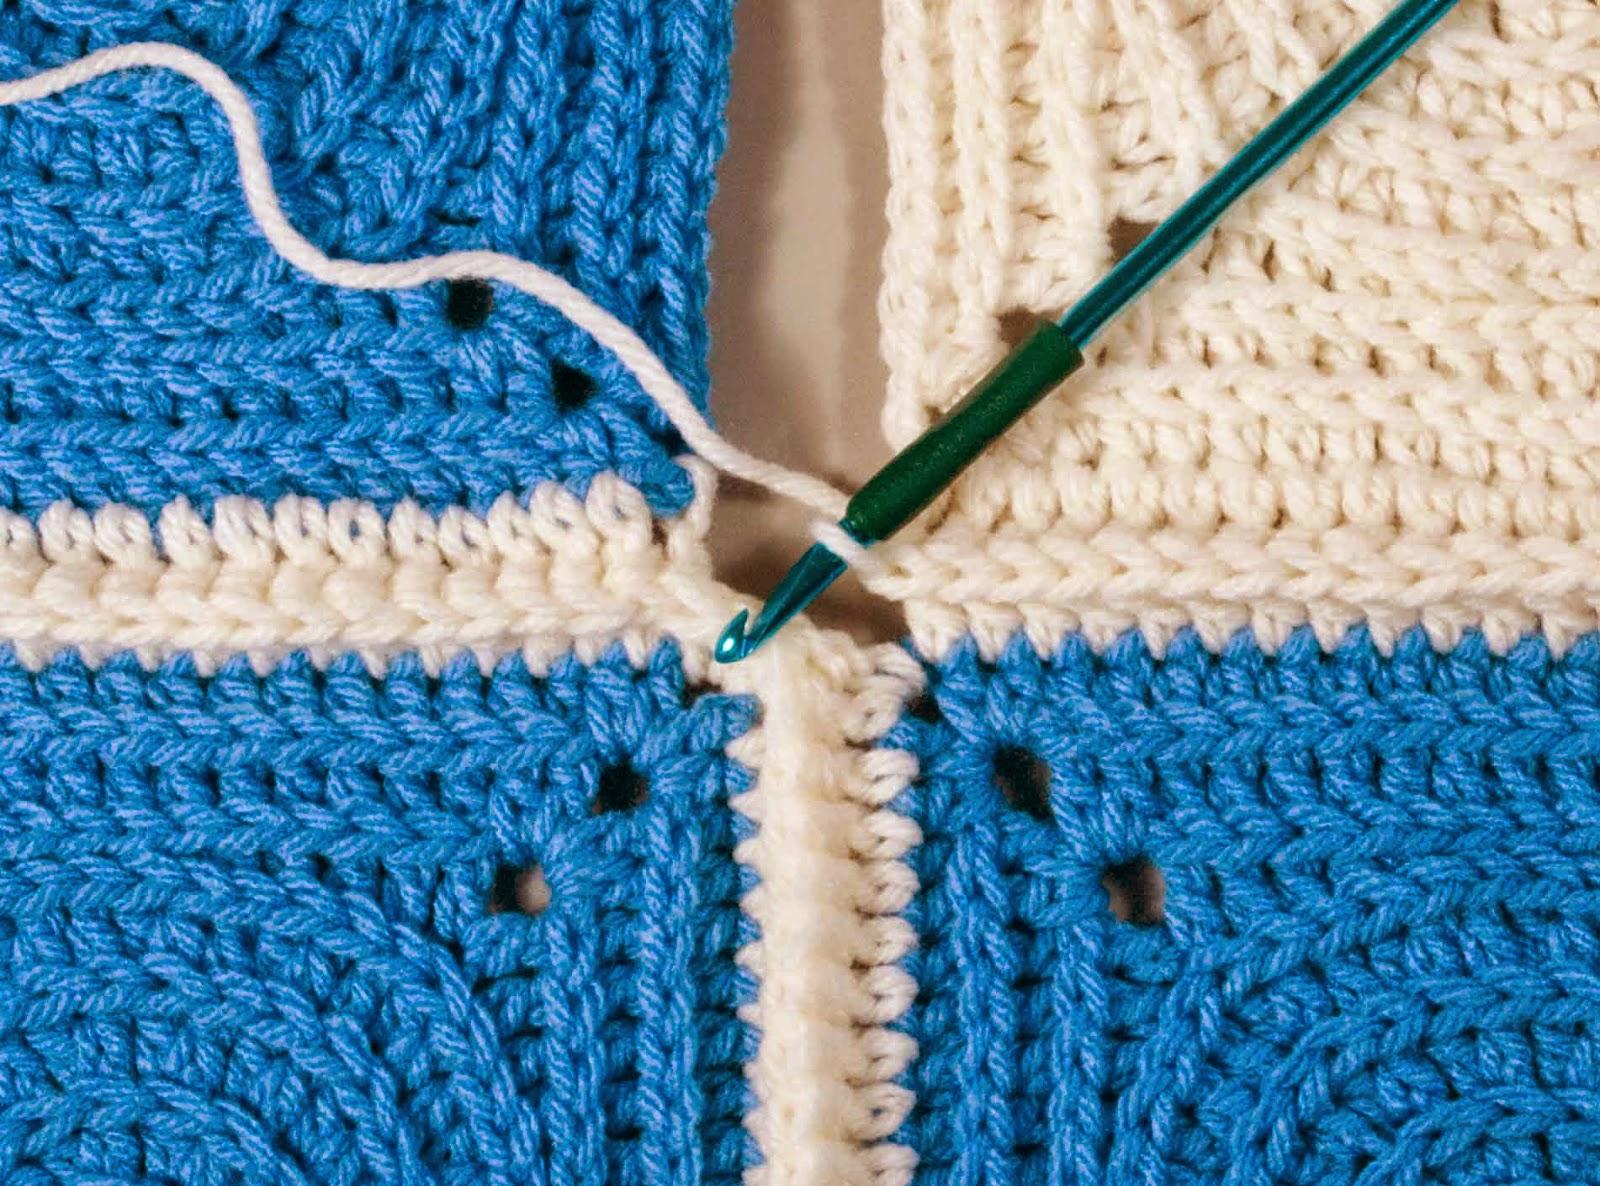 CrochetByKarin: The Double Crochet Connection